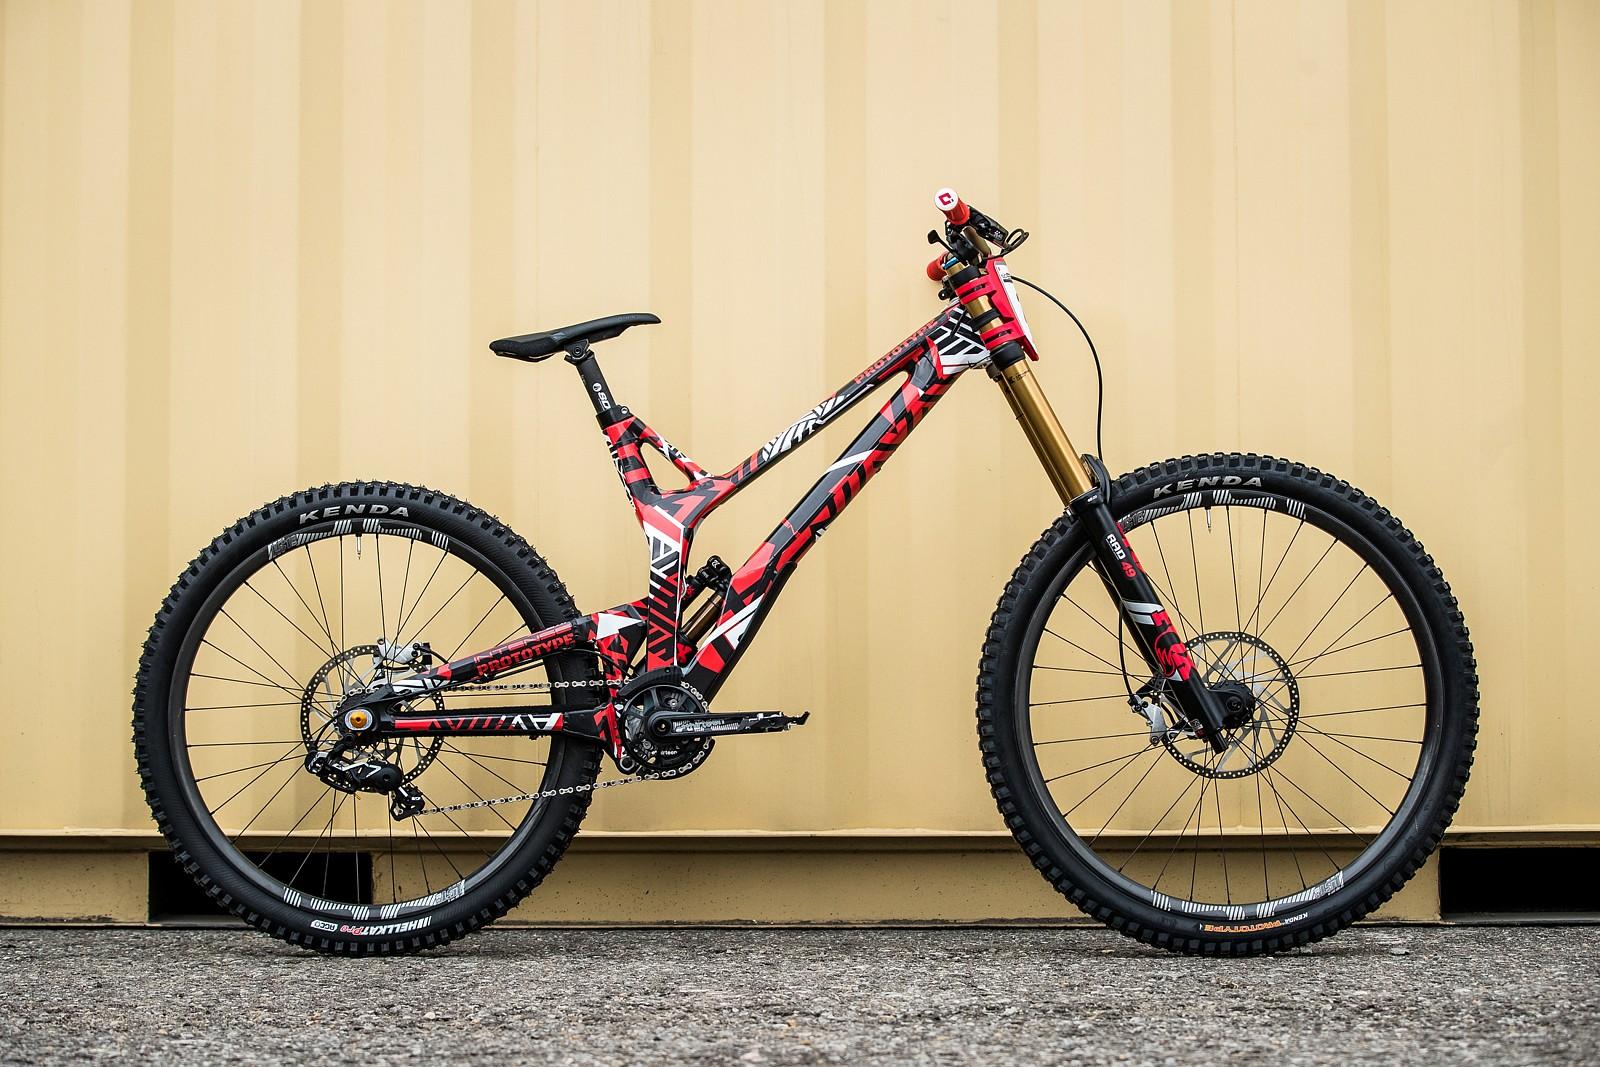 Aaron Gwin's Intense M279 at 2019 Worlds MSA - Aaron Gwin's Intense M279 at 2019 Worlds MSA - Mountain Biking Pictures - Vital MTB